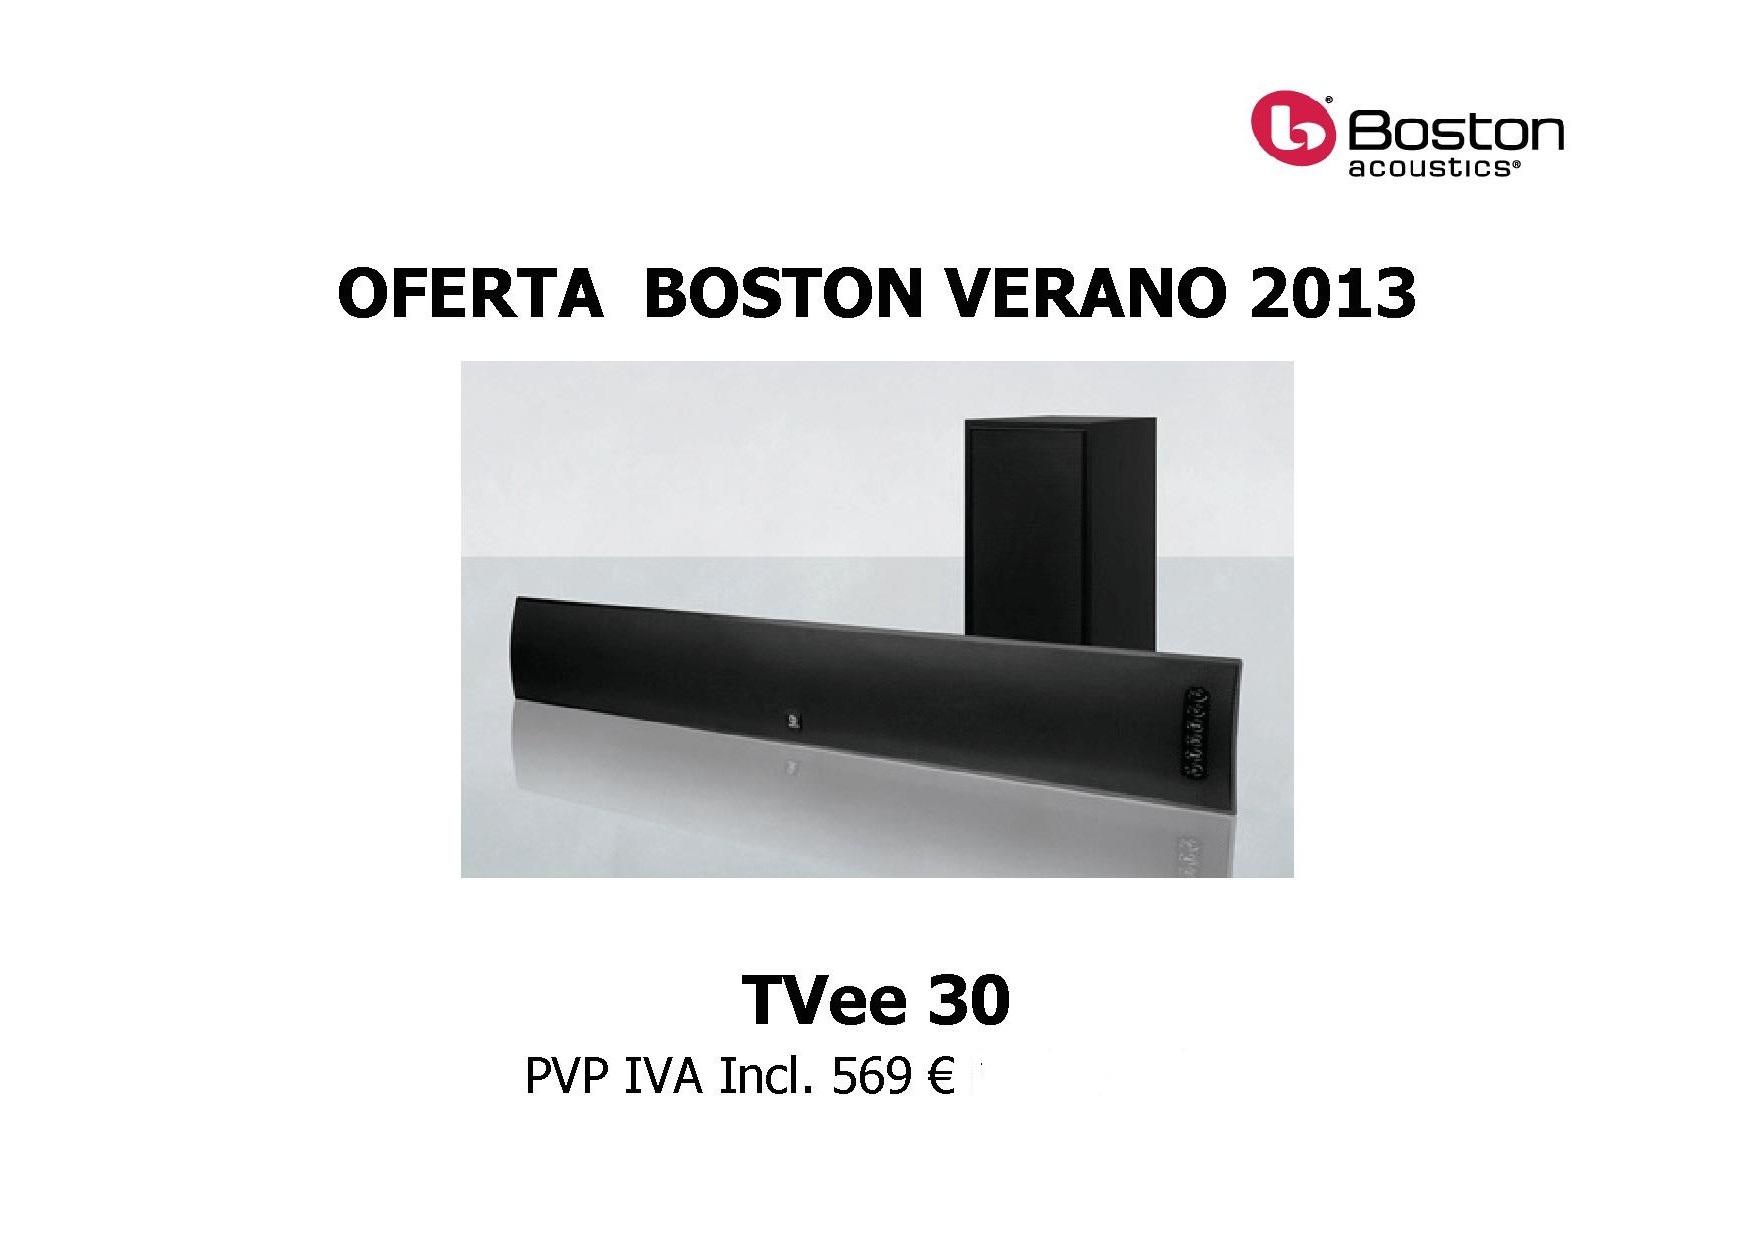 OFERTA TVEE30